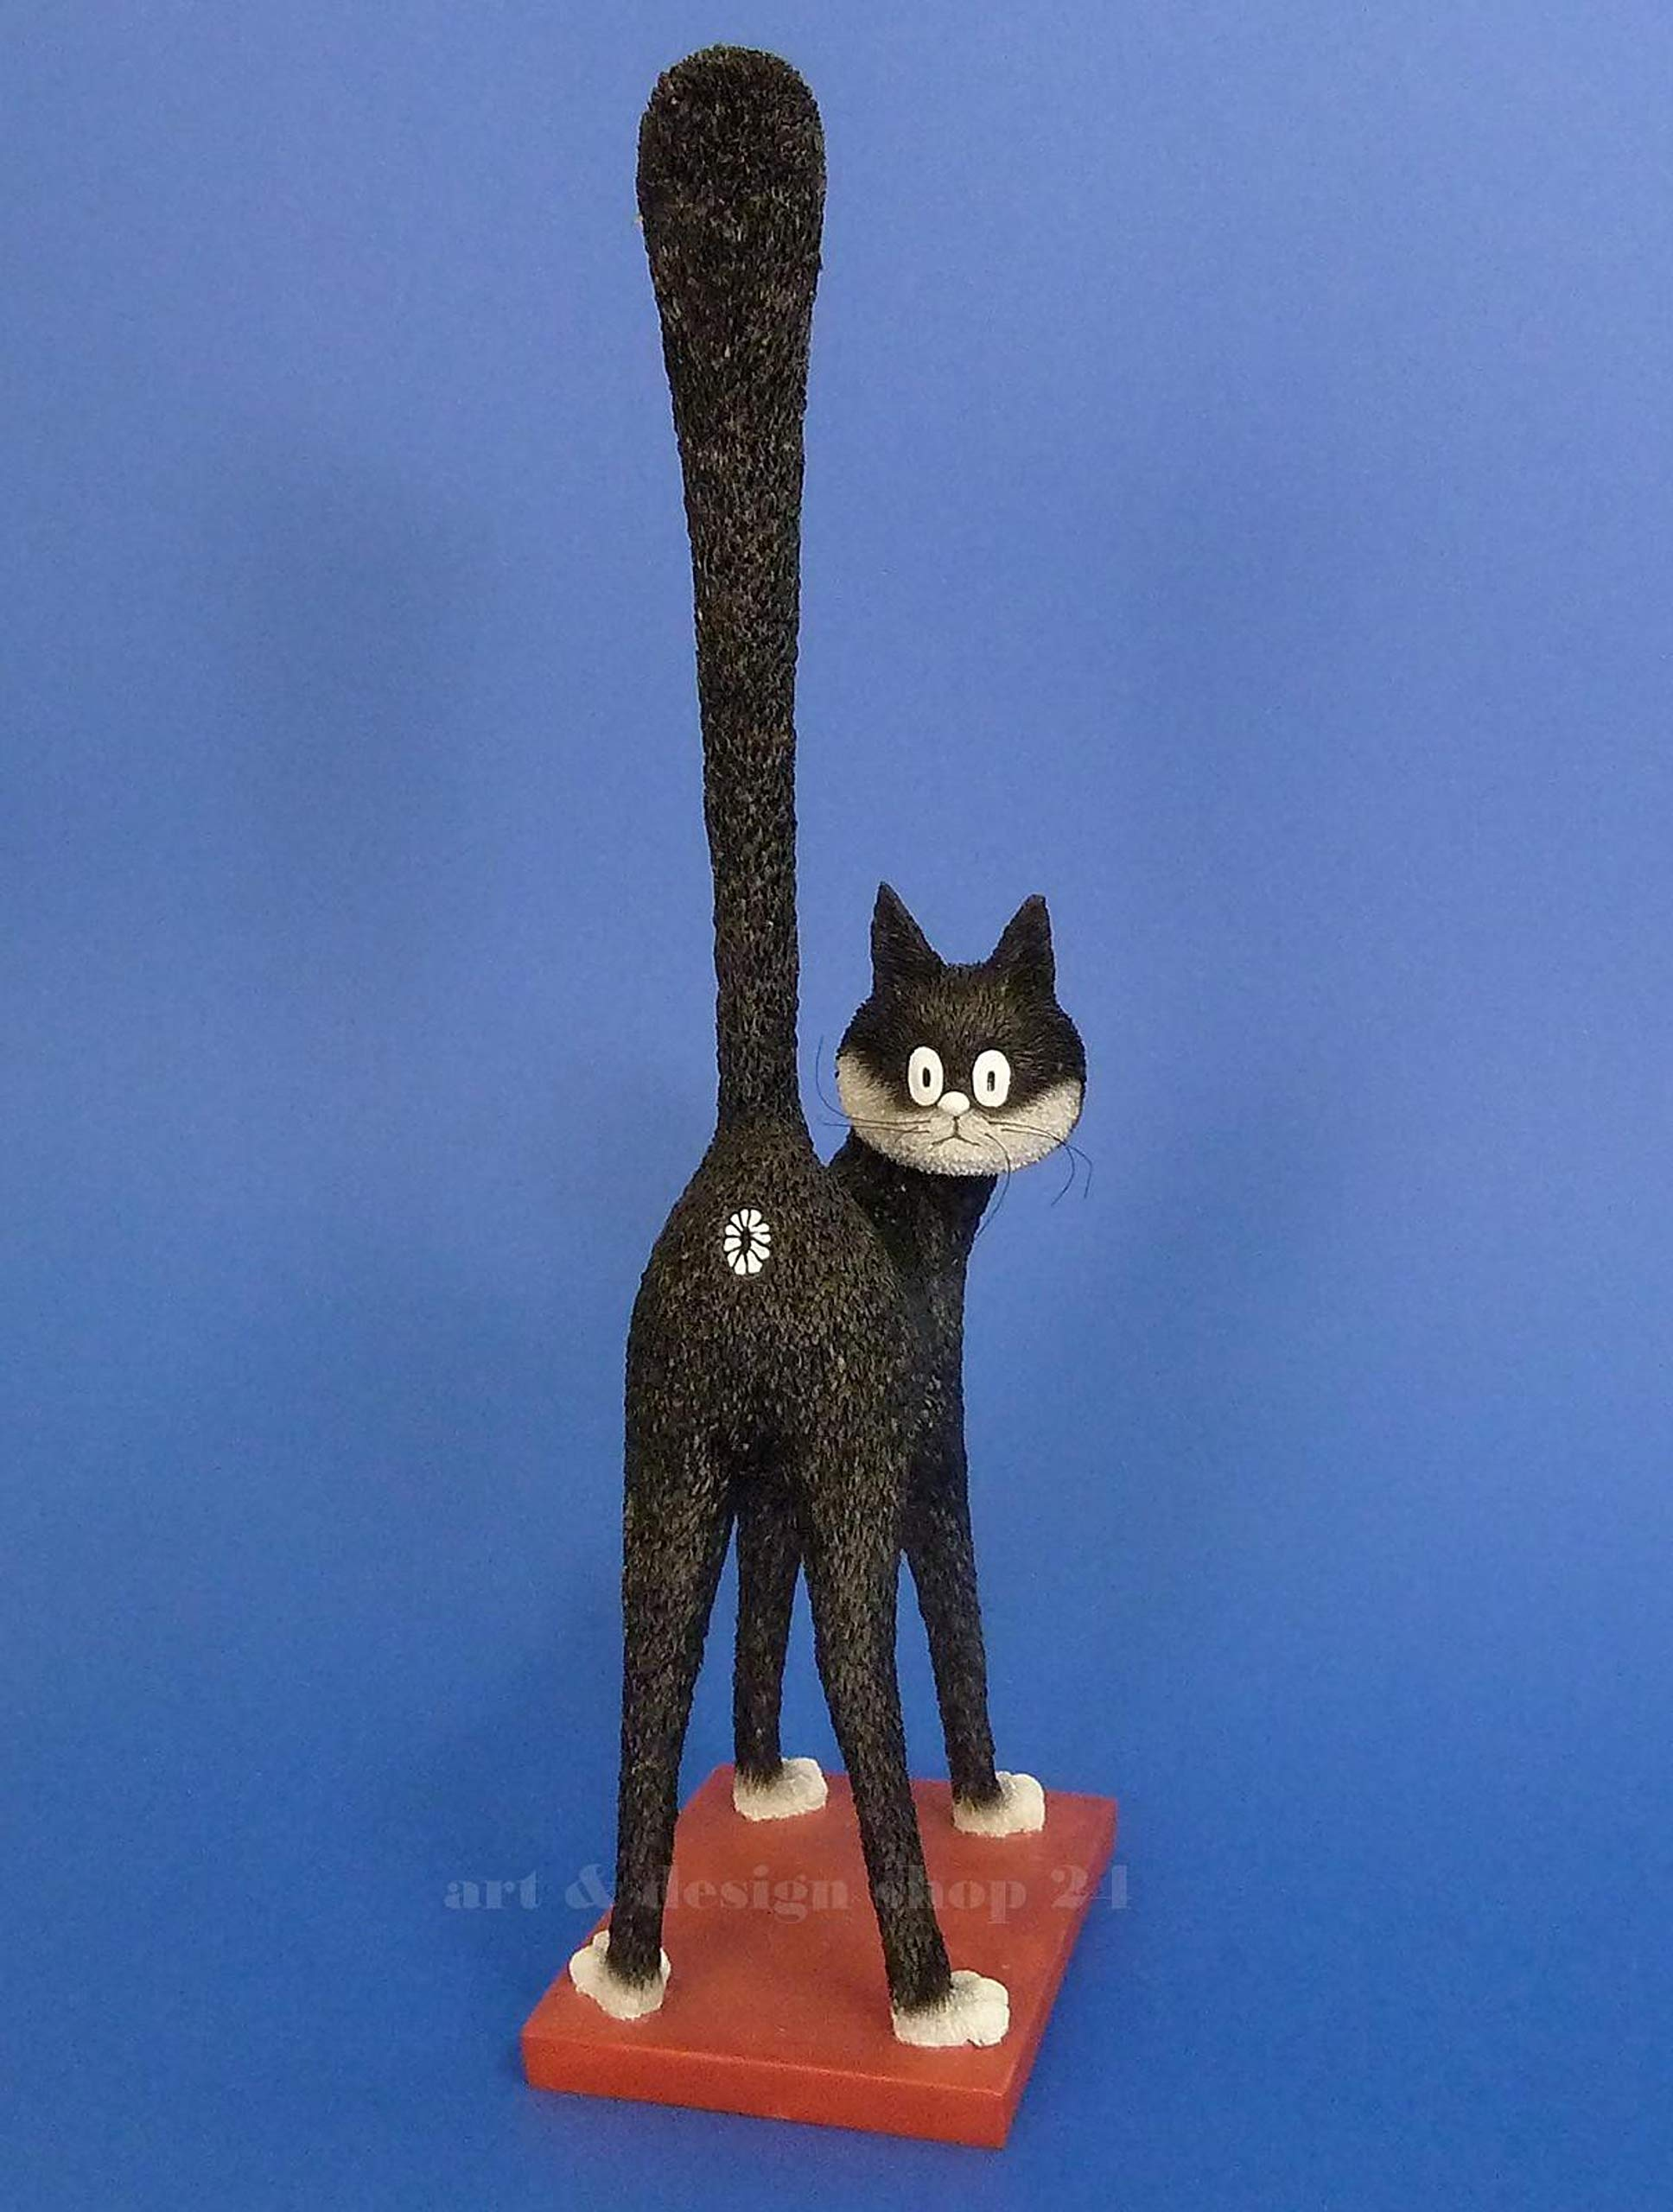 Los Gatos de Dubout - El tercer Ojo - 33 cm - segun un dibujo de ...